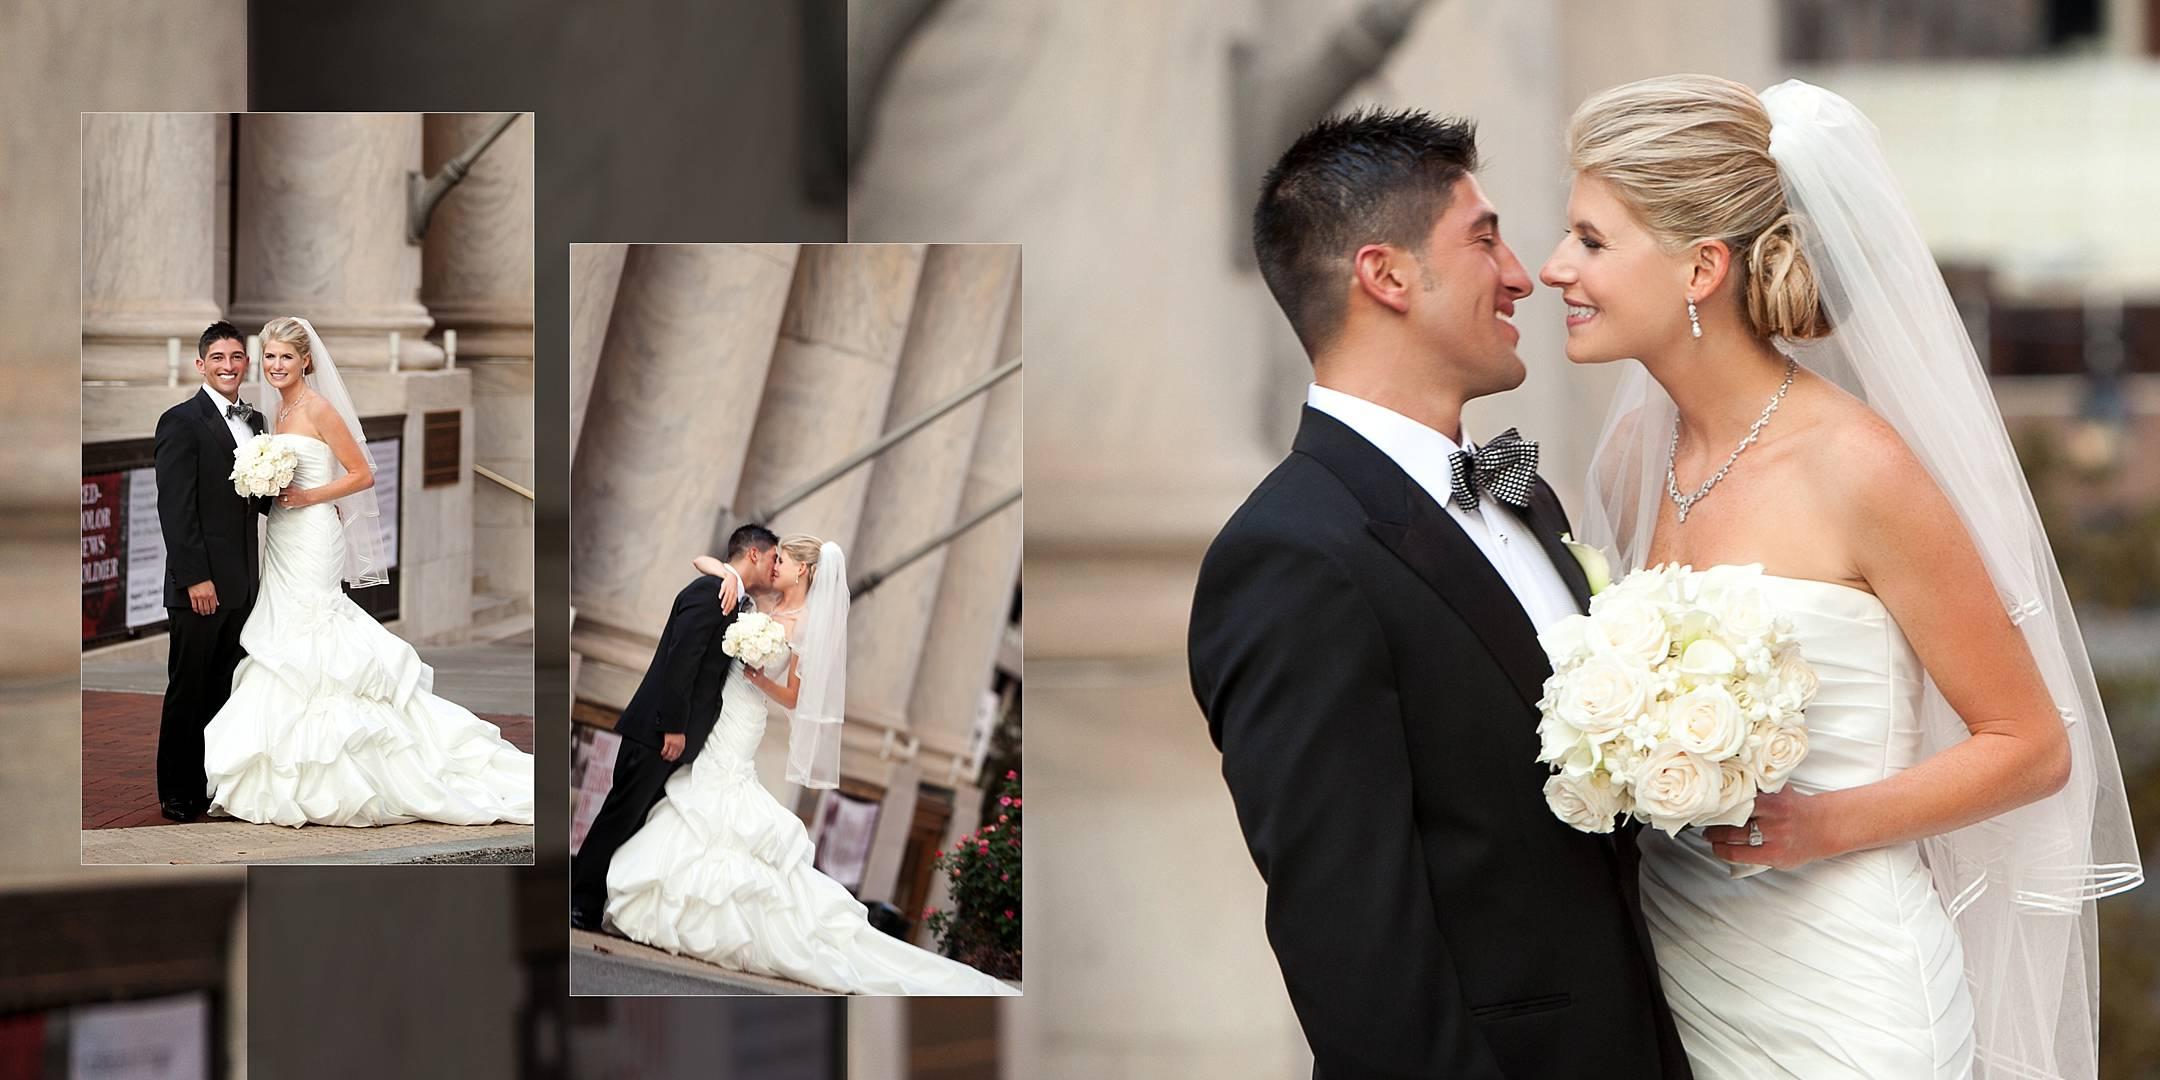 schmidt-photo-wedding-photography-chicago_2304